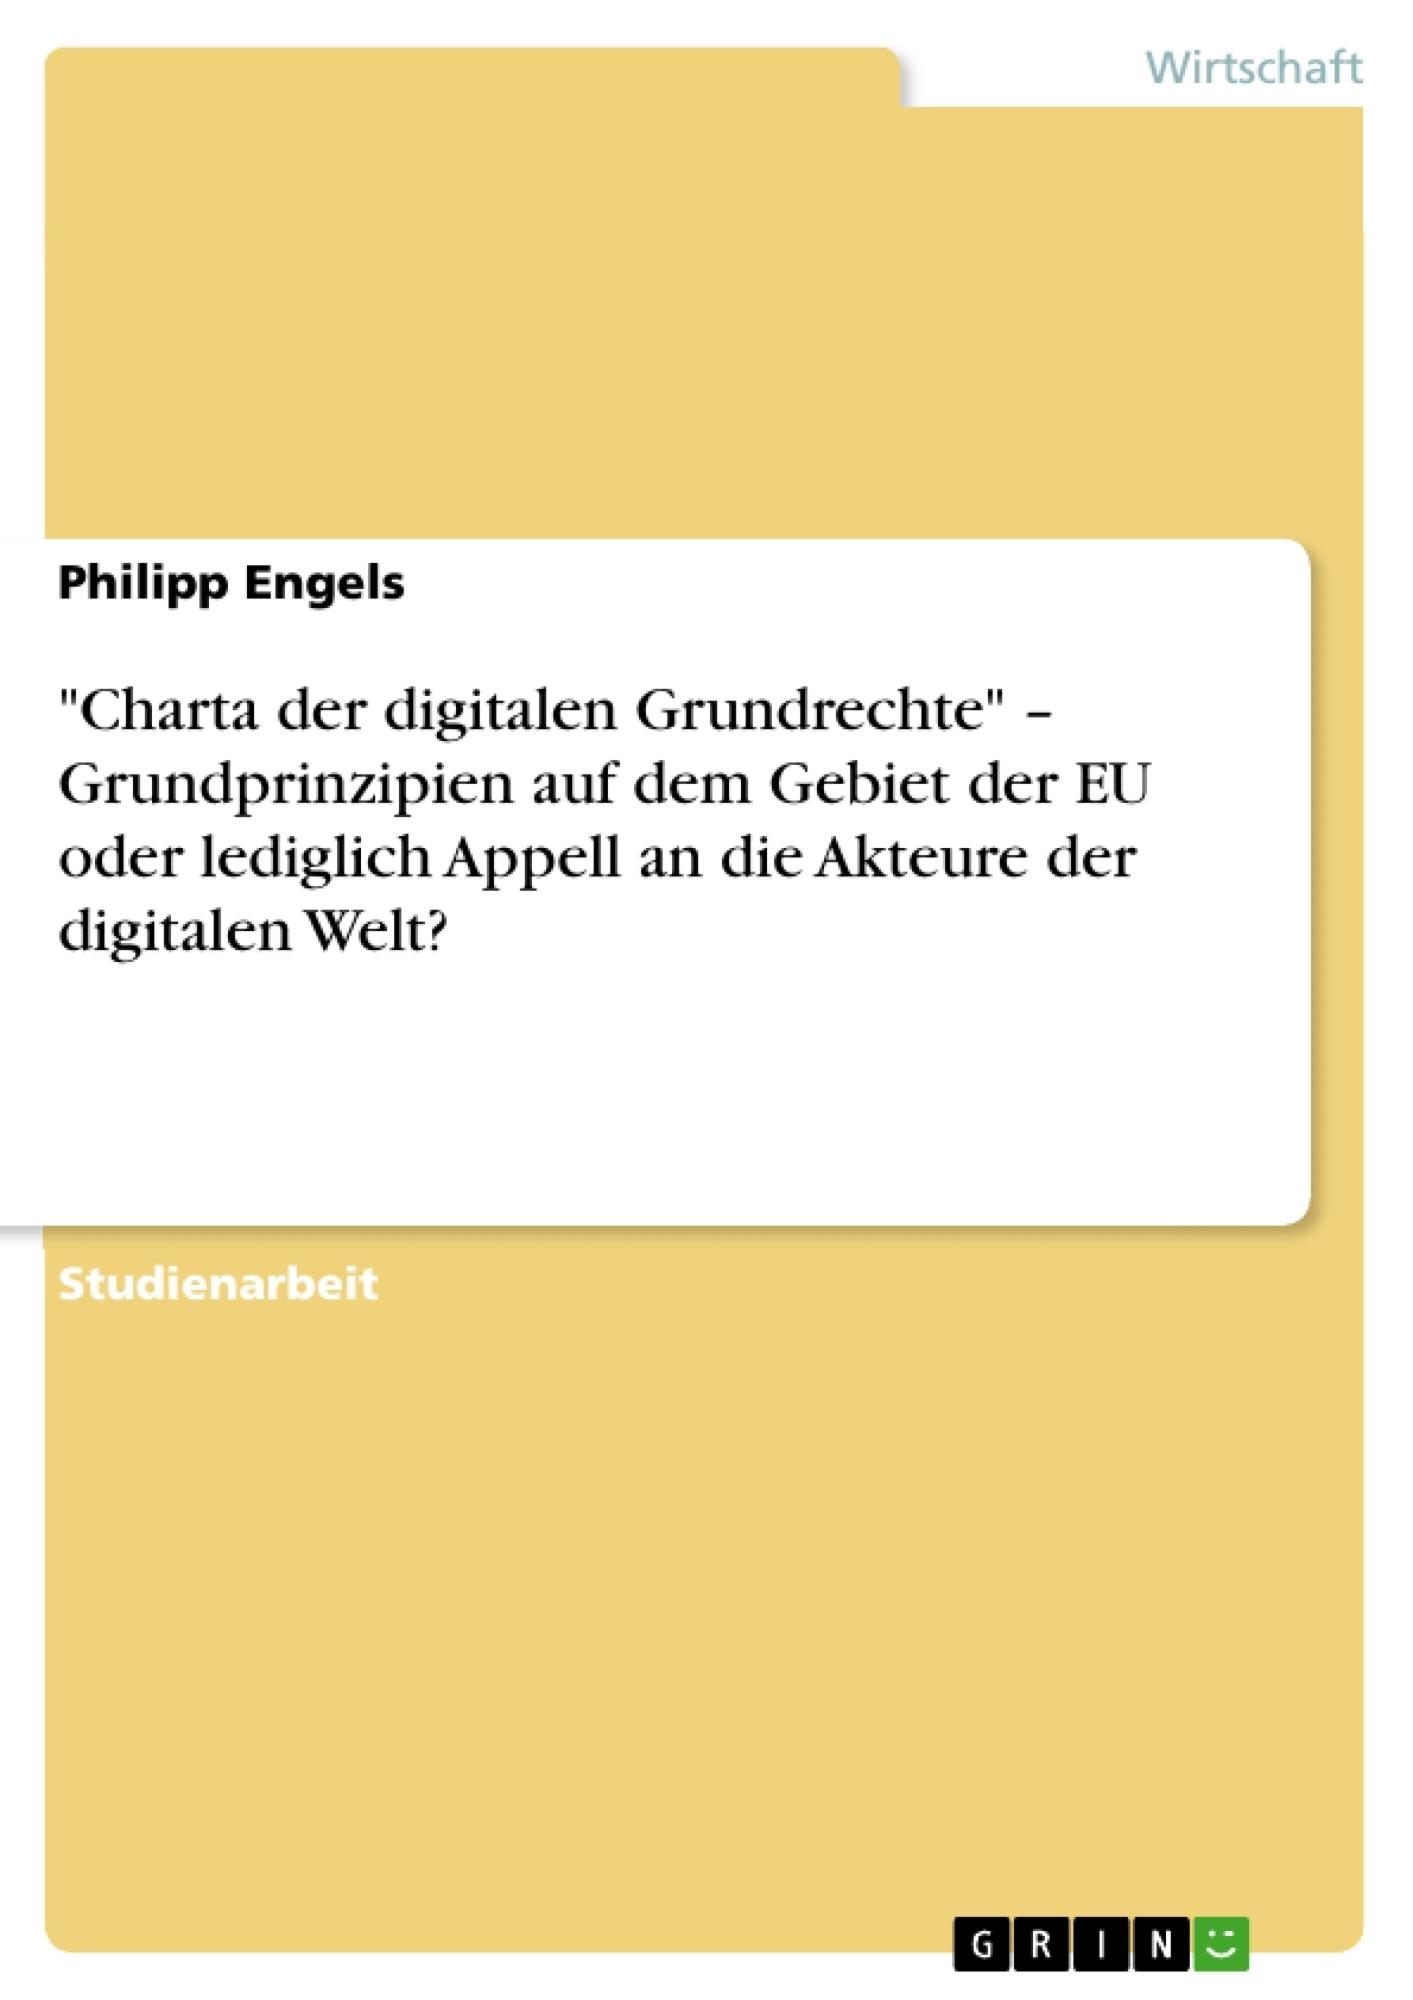 "Titel: ""Charta der digitalen Grundrechte"" – Grundprinzipien auf dem Gebiet der EU oder lediglich Appell an die Akteure der digitalen Welt?"